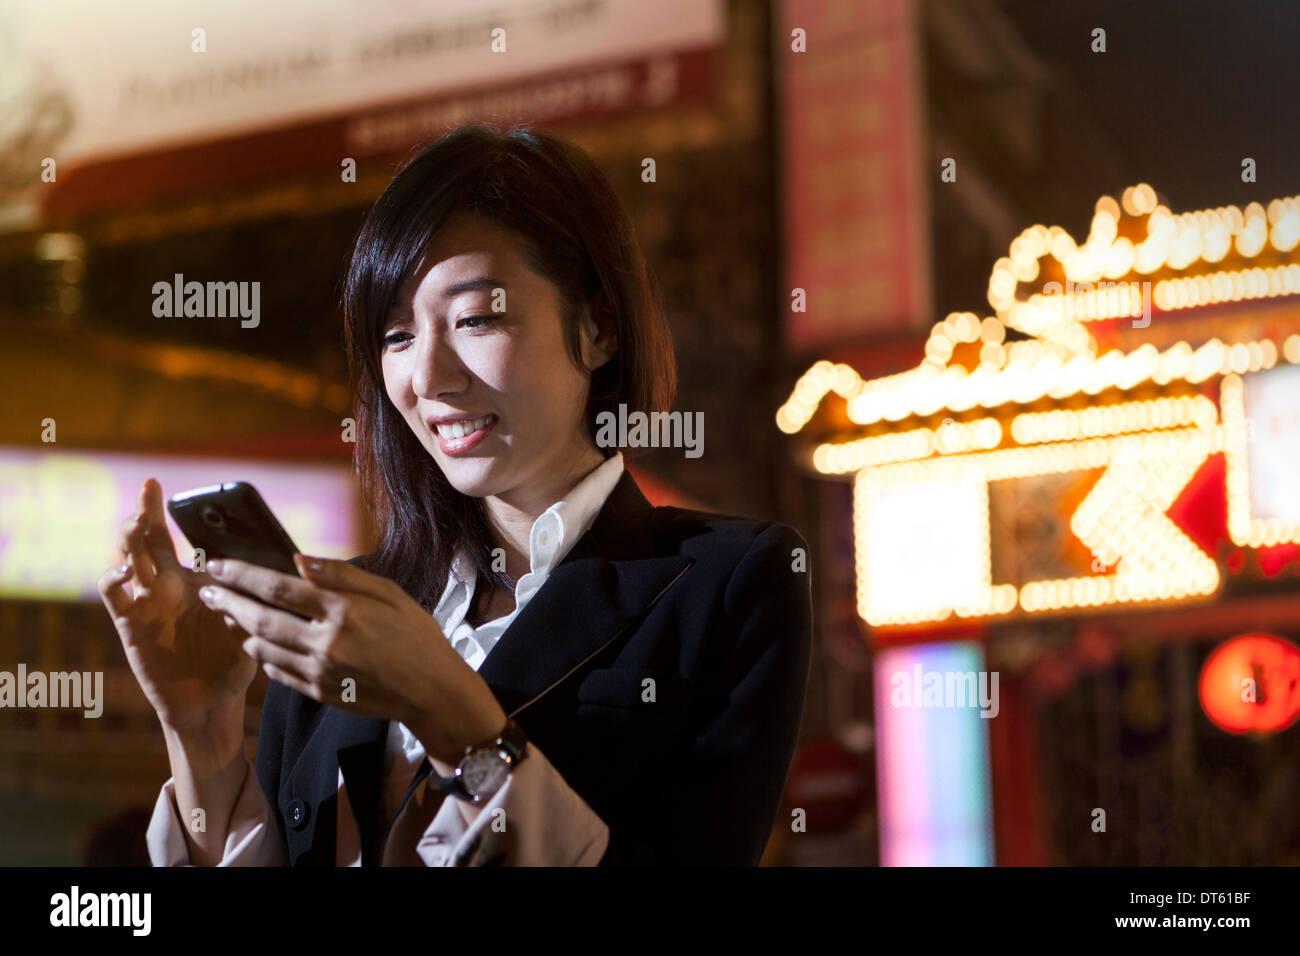 Businesswoman using cellular phone, night market, Taipei, Taiwan - Stock Image